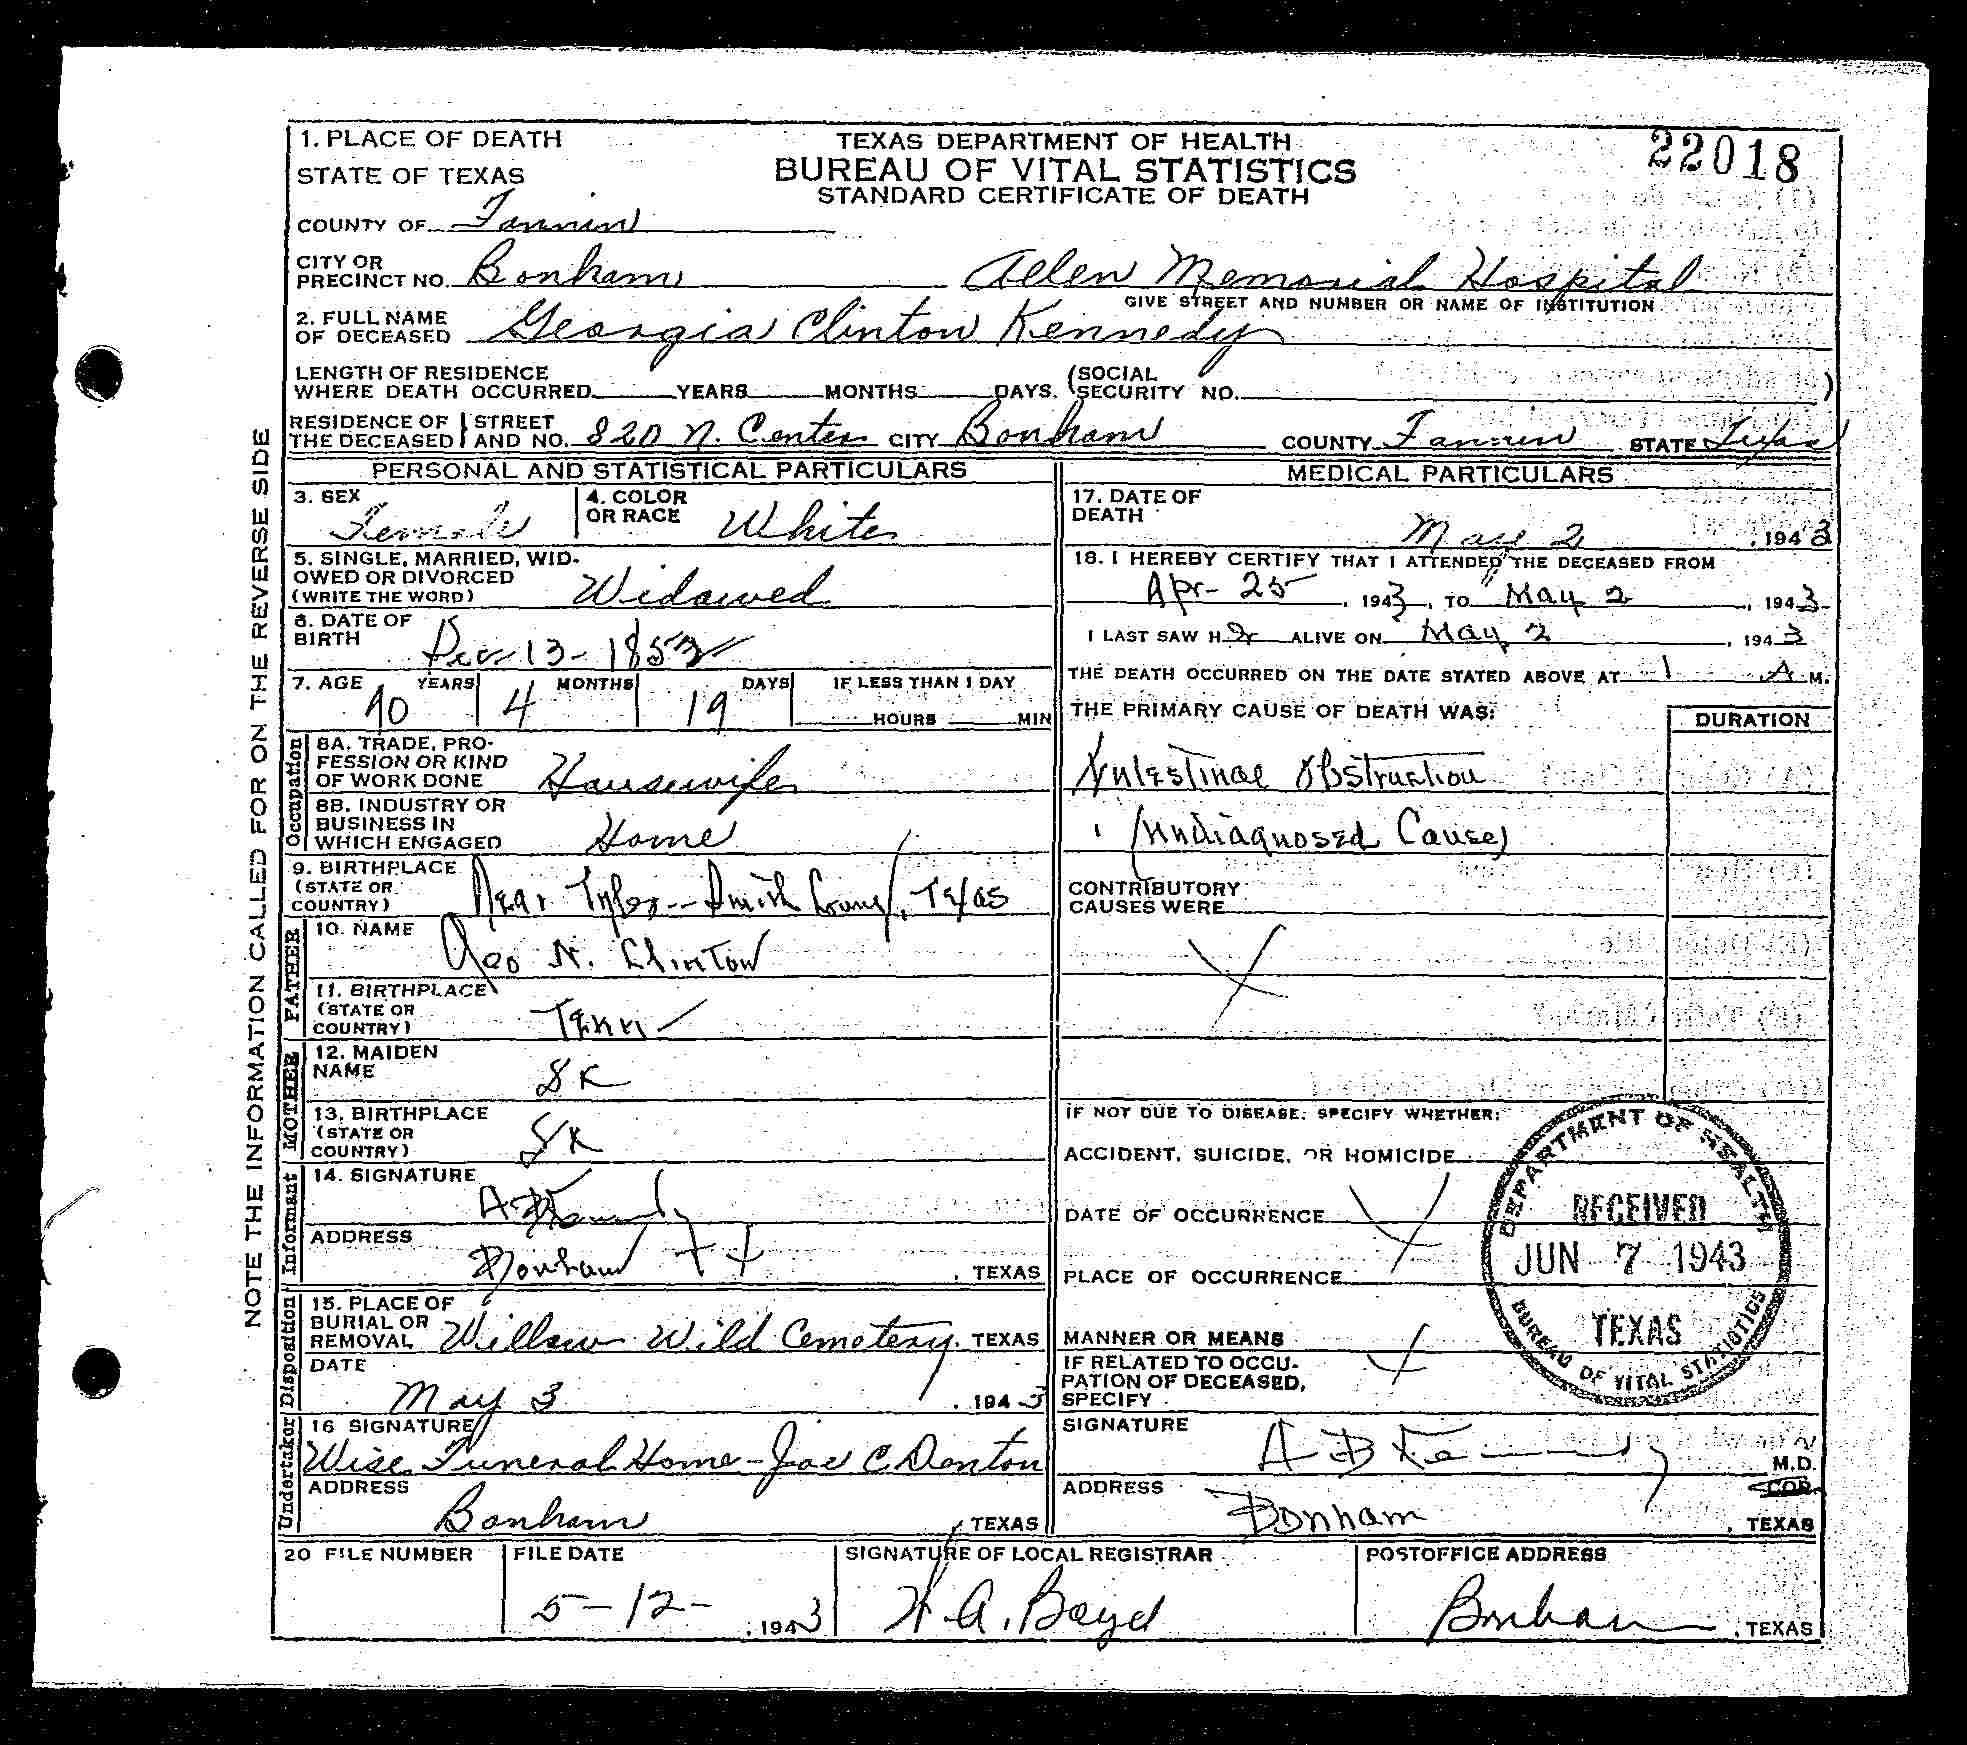 Vital Records 1943 Death Certificate Bonham Fannin County Texas